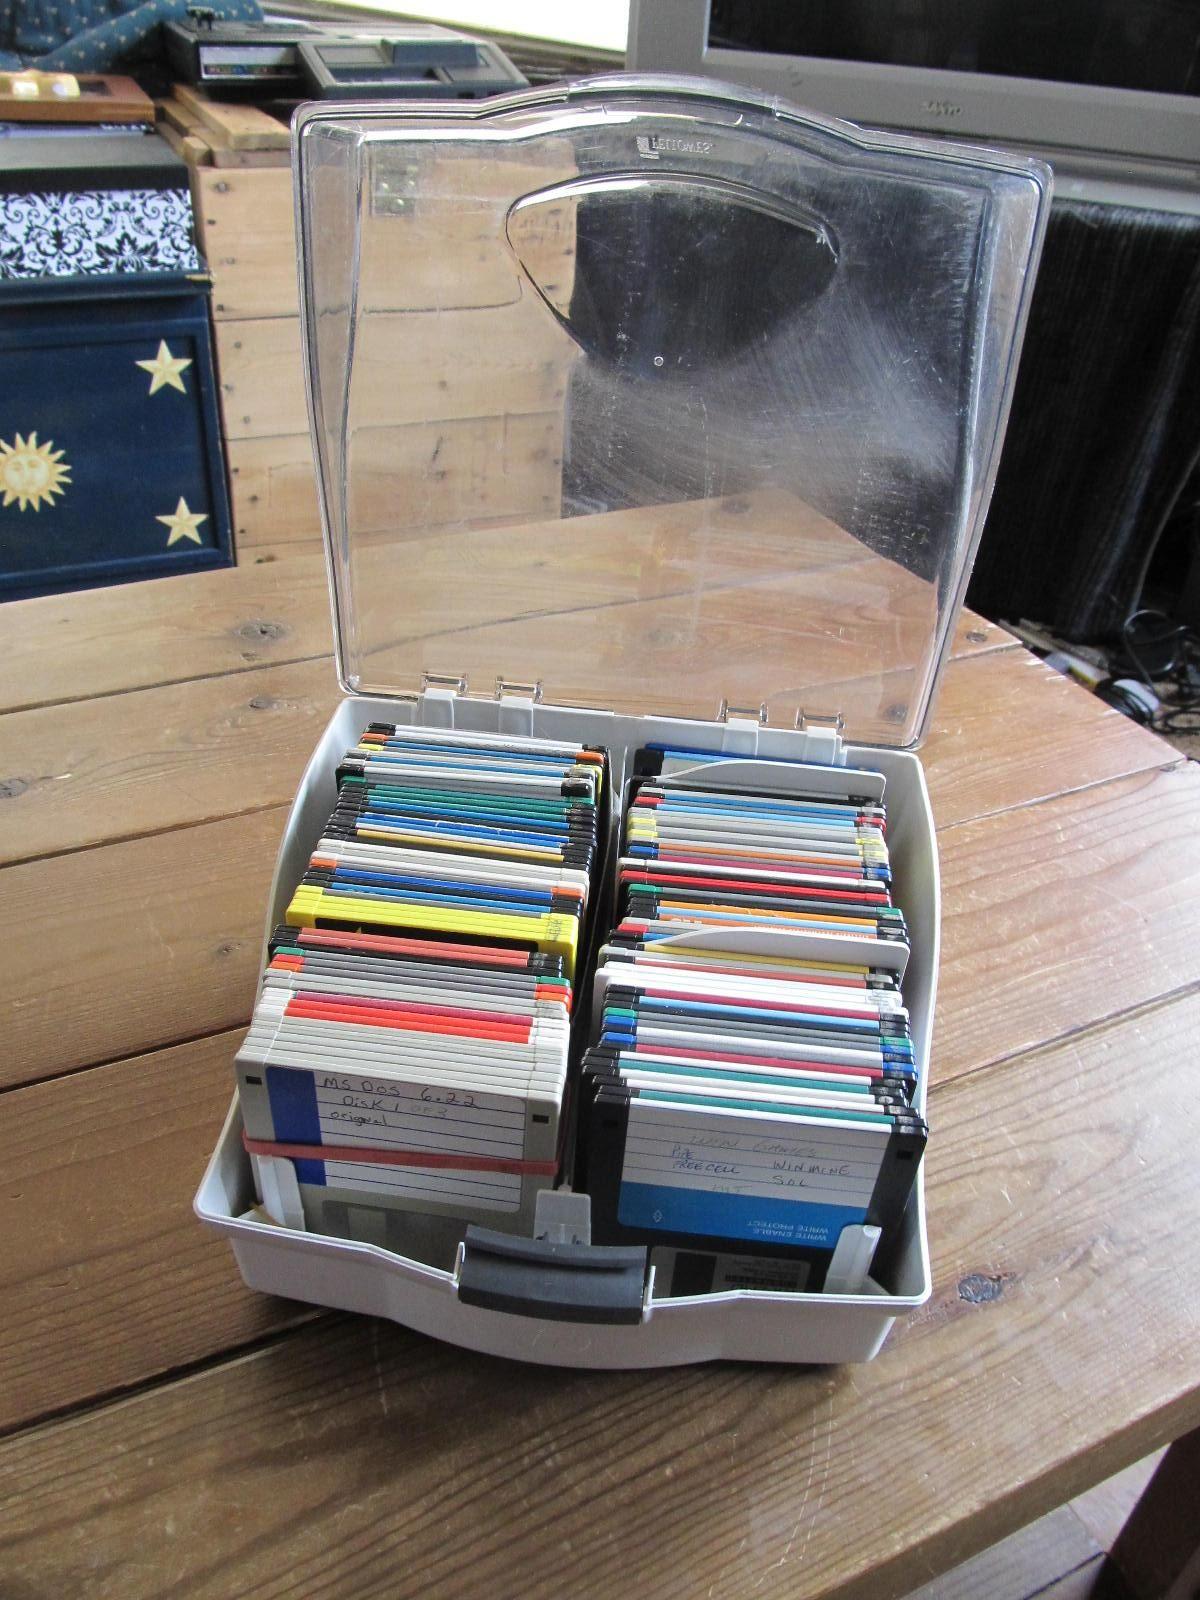 I've still got a box of Save Buttons I mean floppy disks